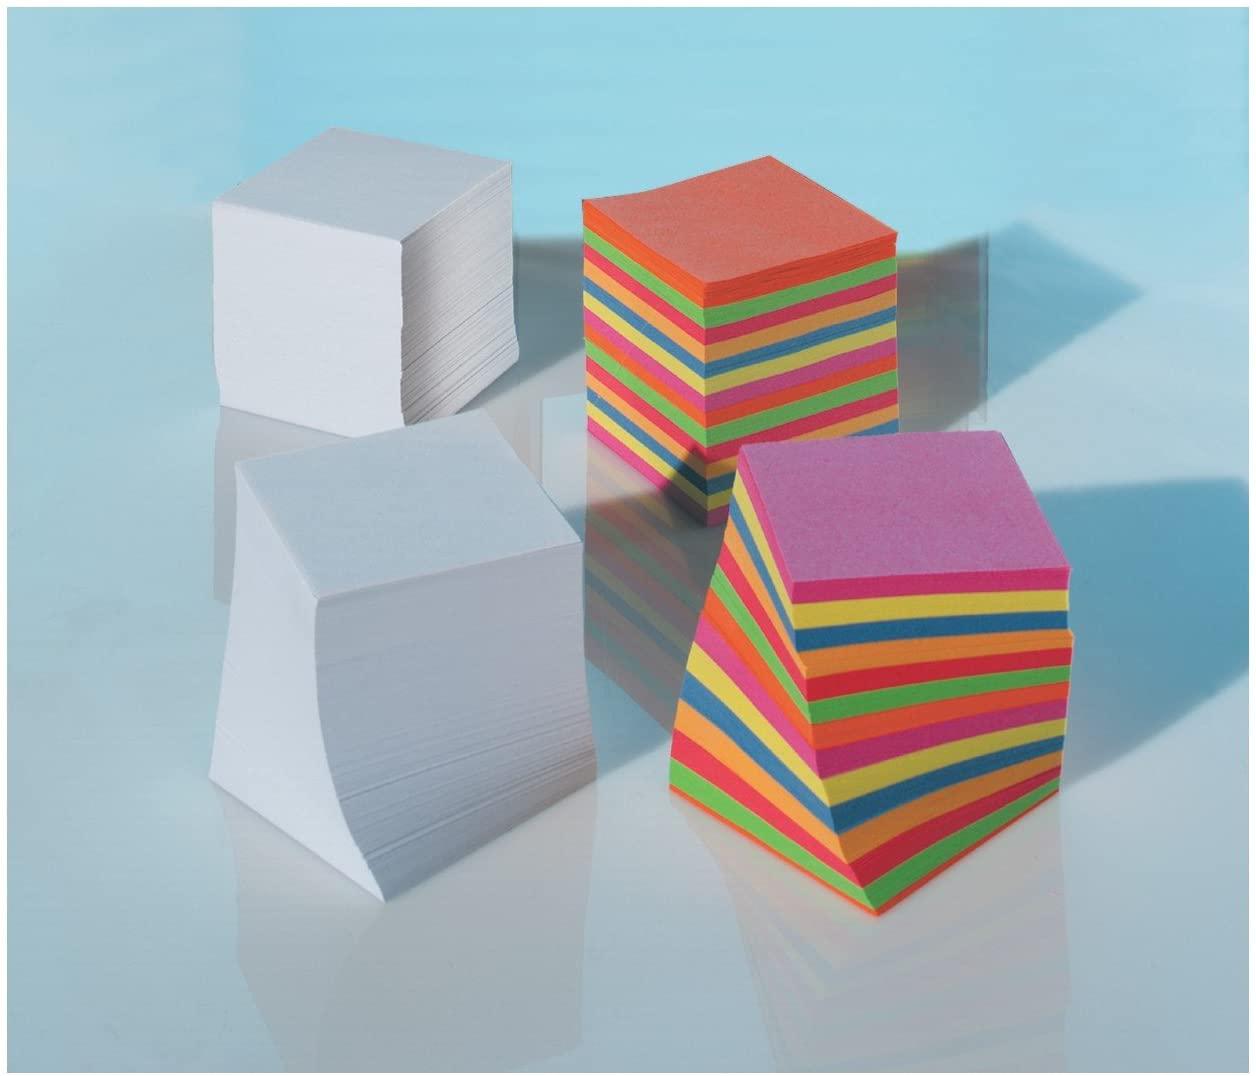 folia 9910/E - Notizklotz, Note Pad, Ersatzfüllung, Ersatzpapier für Zettelbox - 90x90x90 mm - weiß